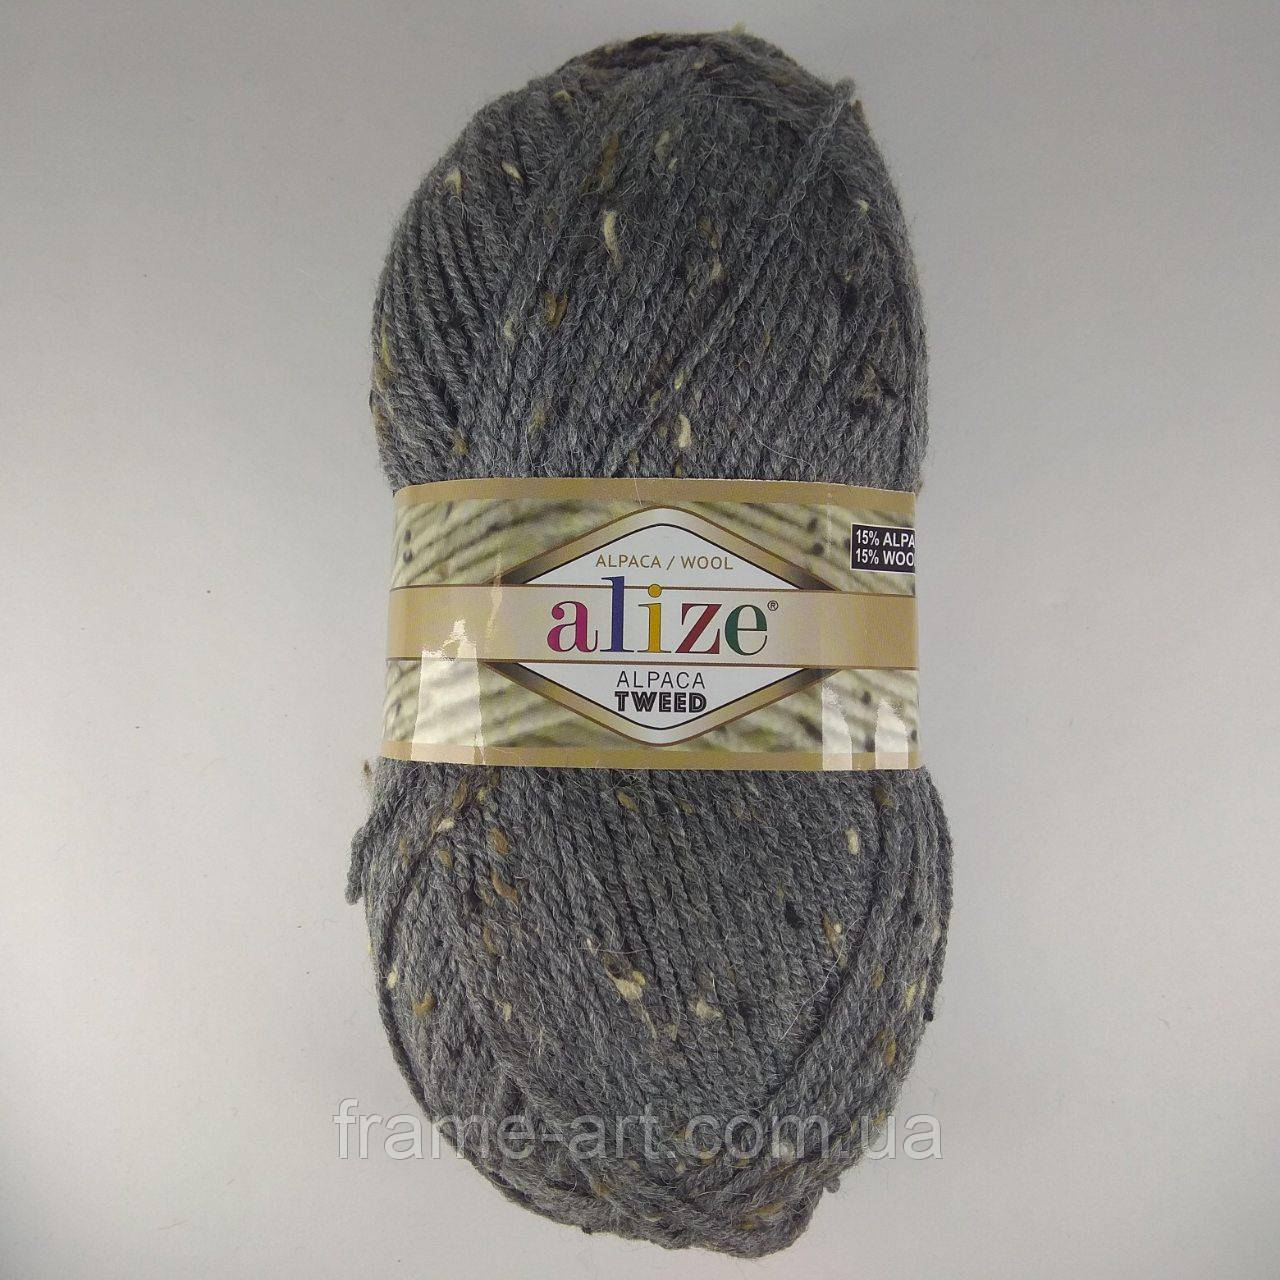 Ализе Альпака Твид (Alize Alpaca Tweed) 100г/150м 196 серый меланж